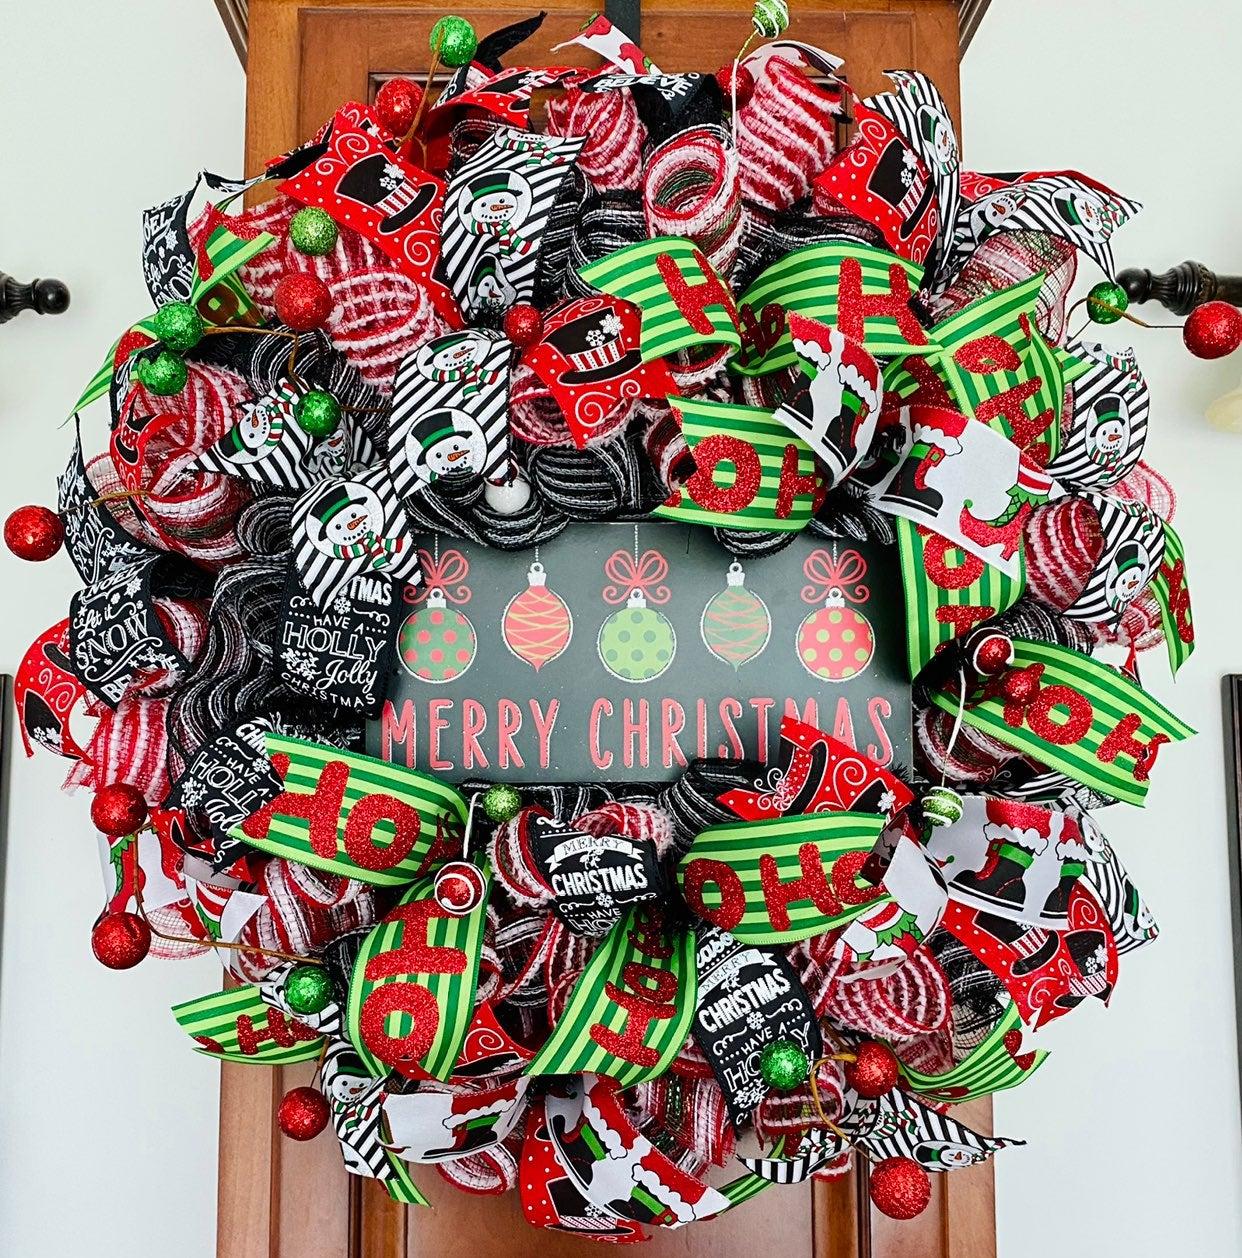 Christmas Wreath with Merry Christmas si